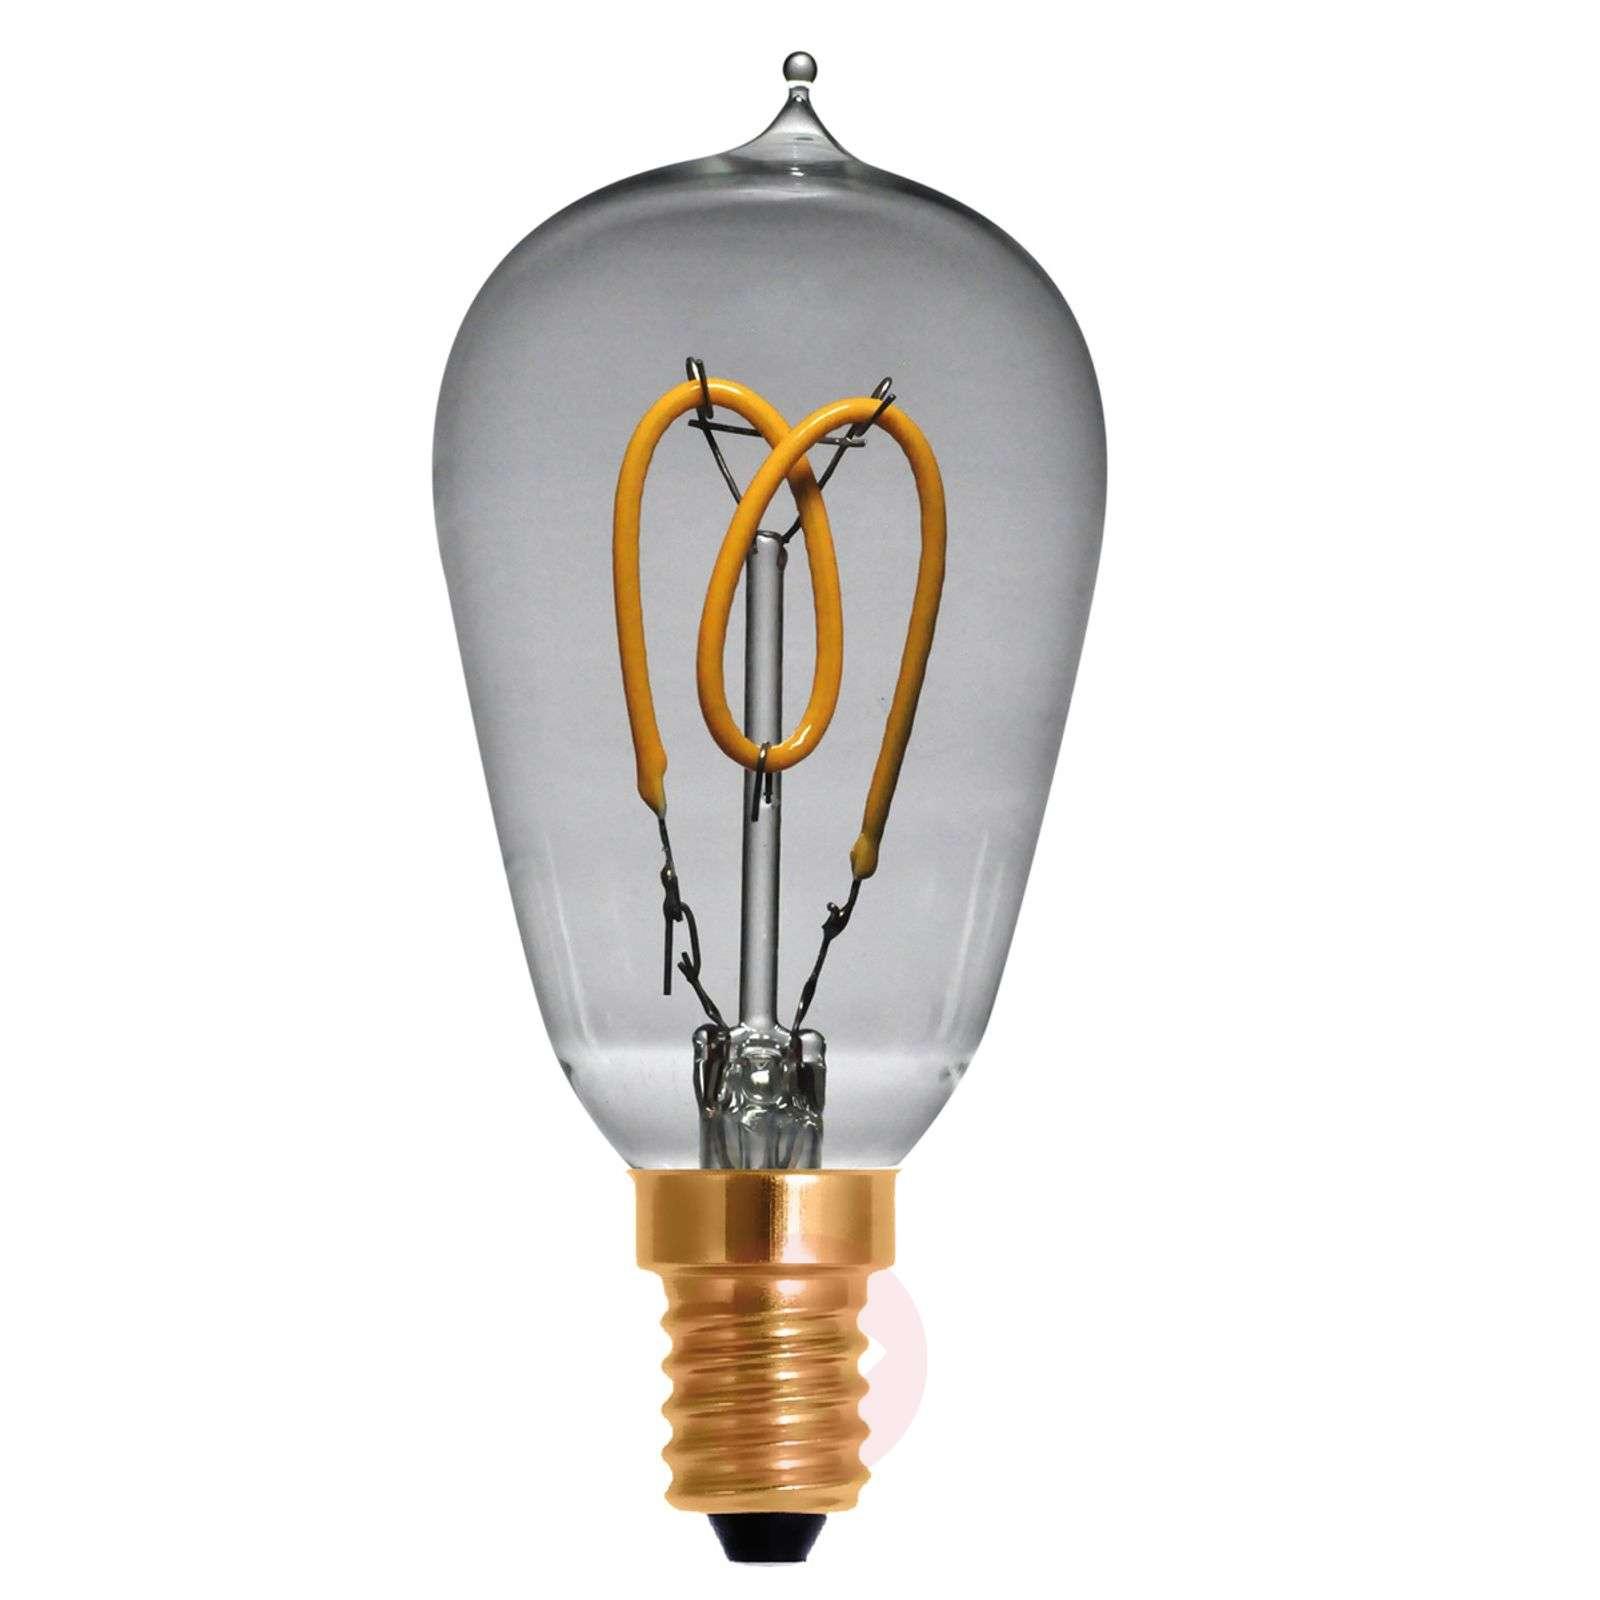 LED-pisaralamppu Curved Line E14 2,7W 922, 360degree-8536159-01